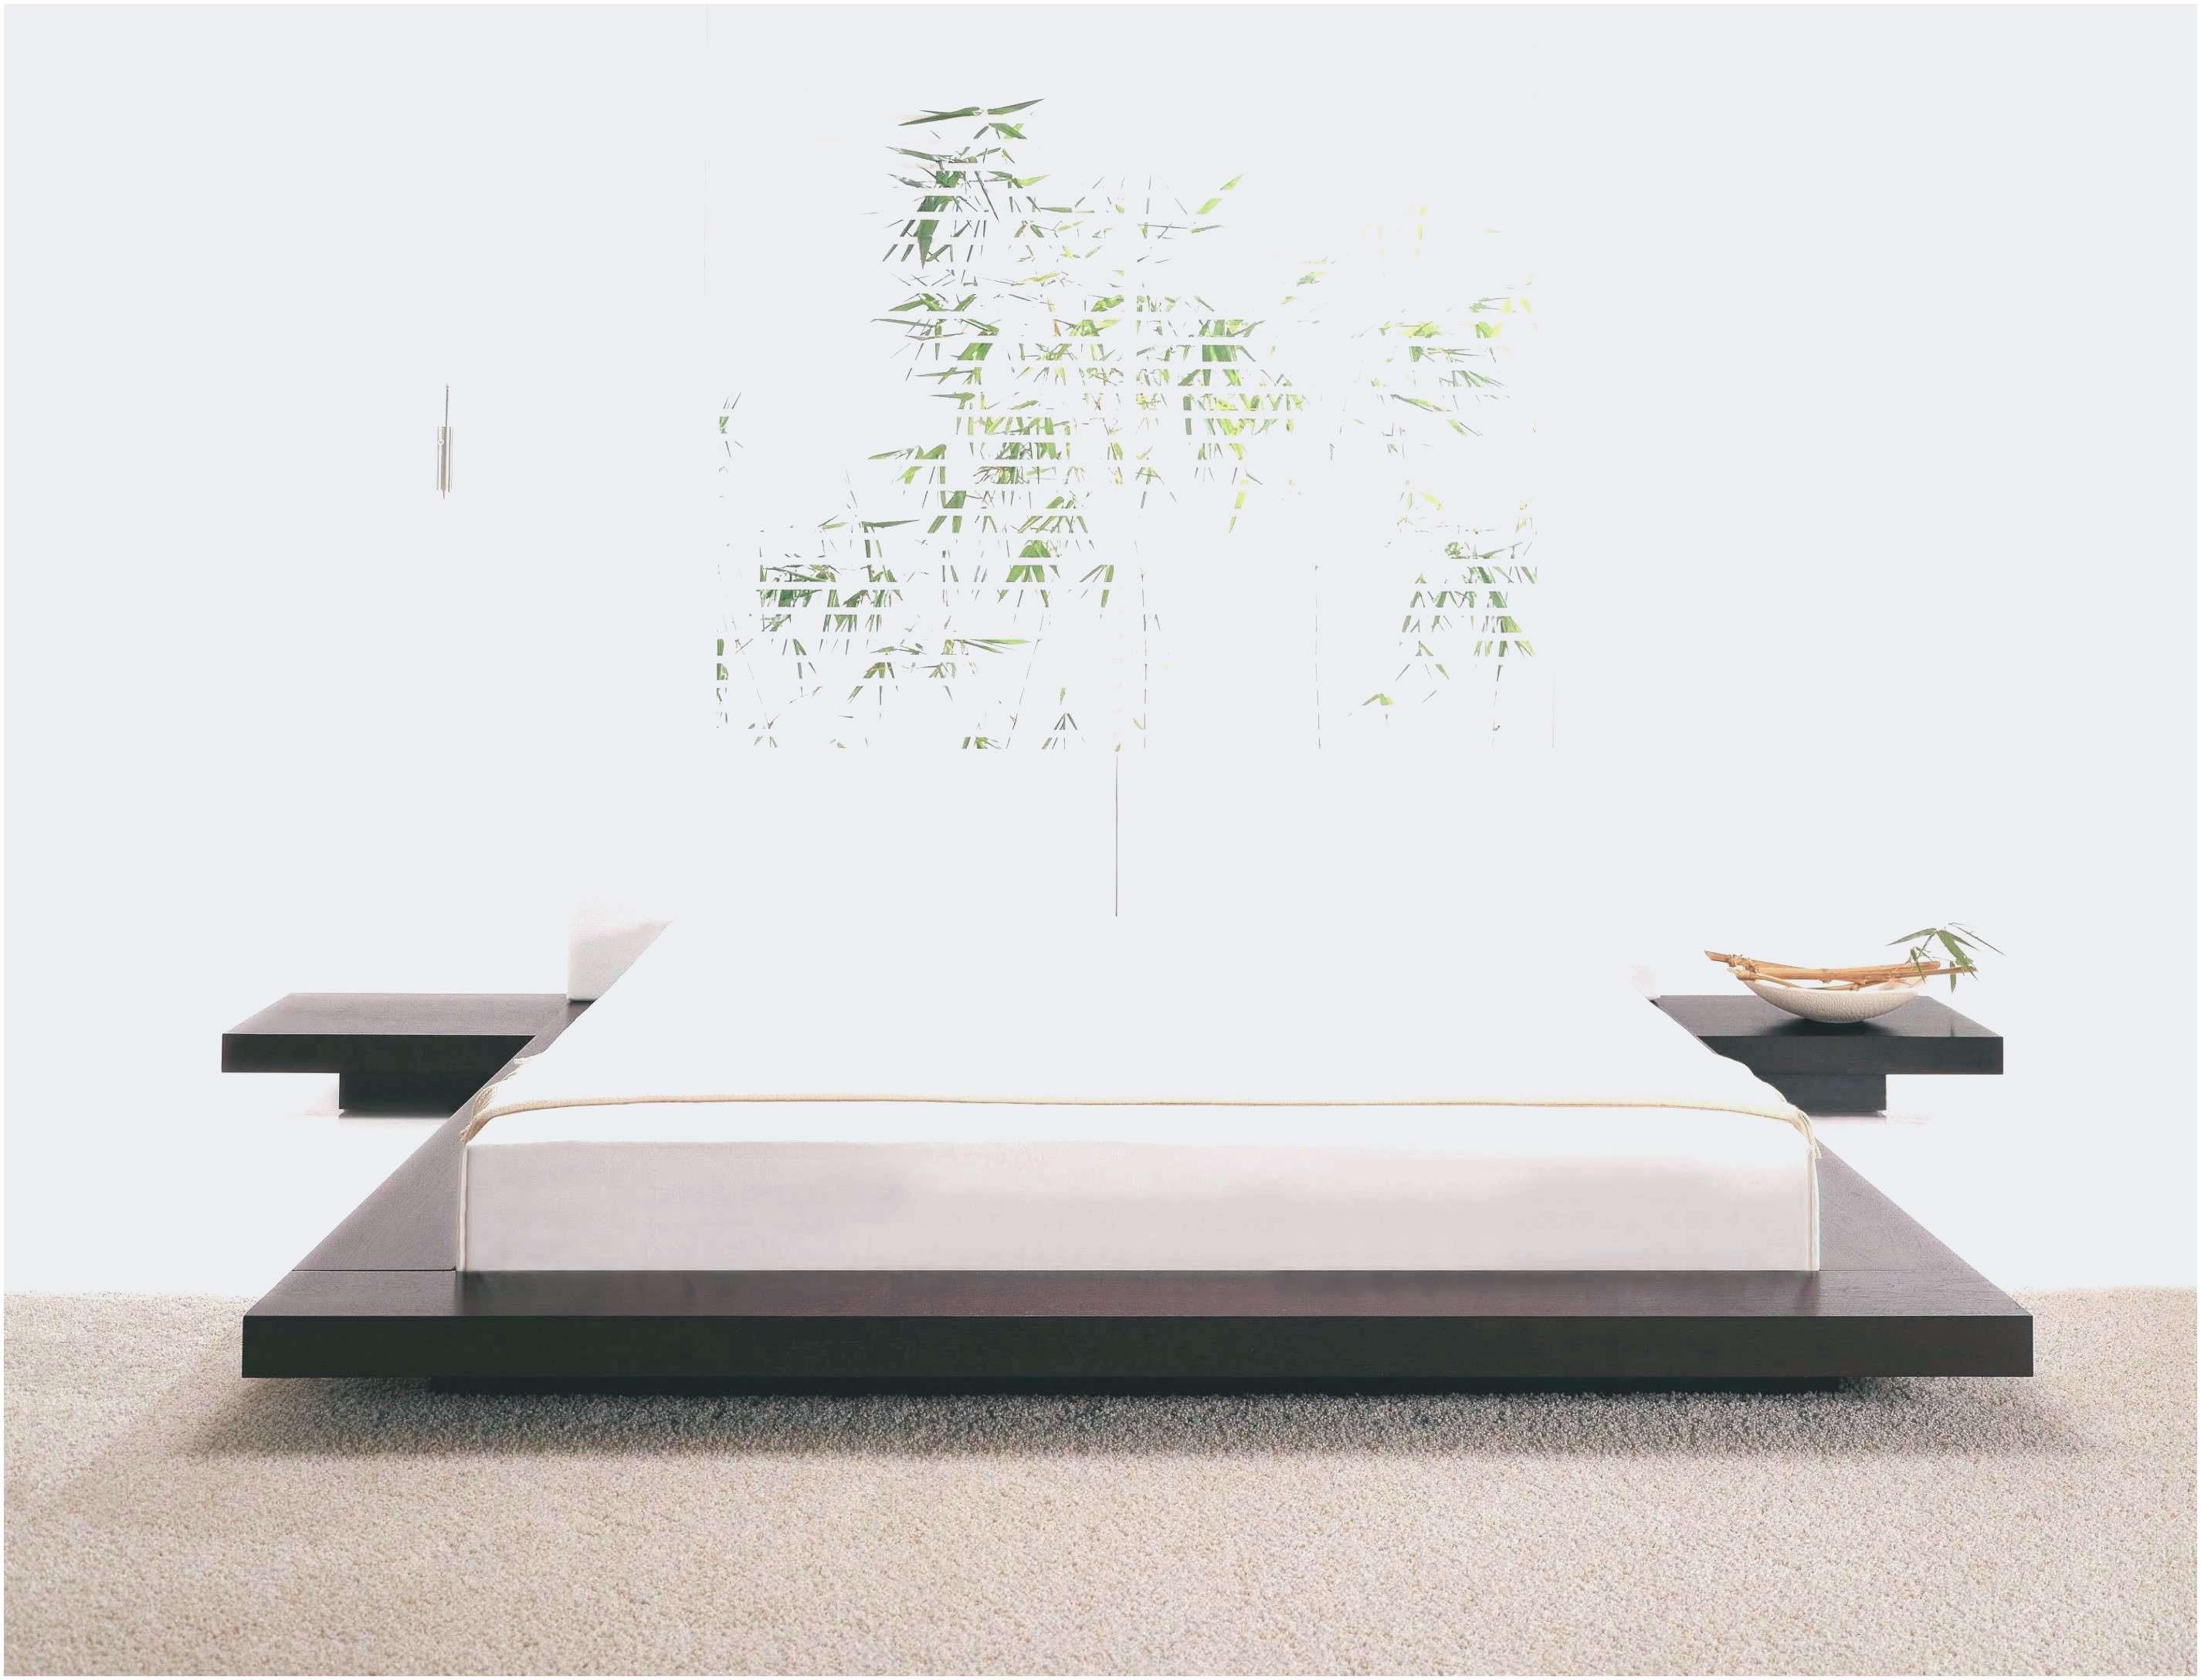 Tete De Lit Ikea Malm Frais Elégant Einzelbett 90—200 Luxus Ikea Malm Bett Schön Japanisches